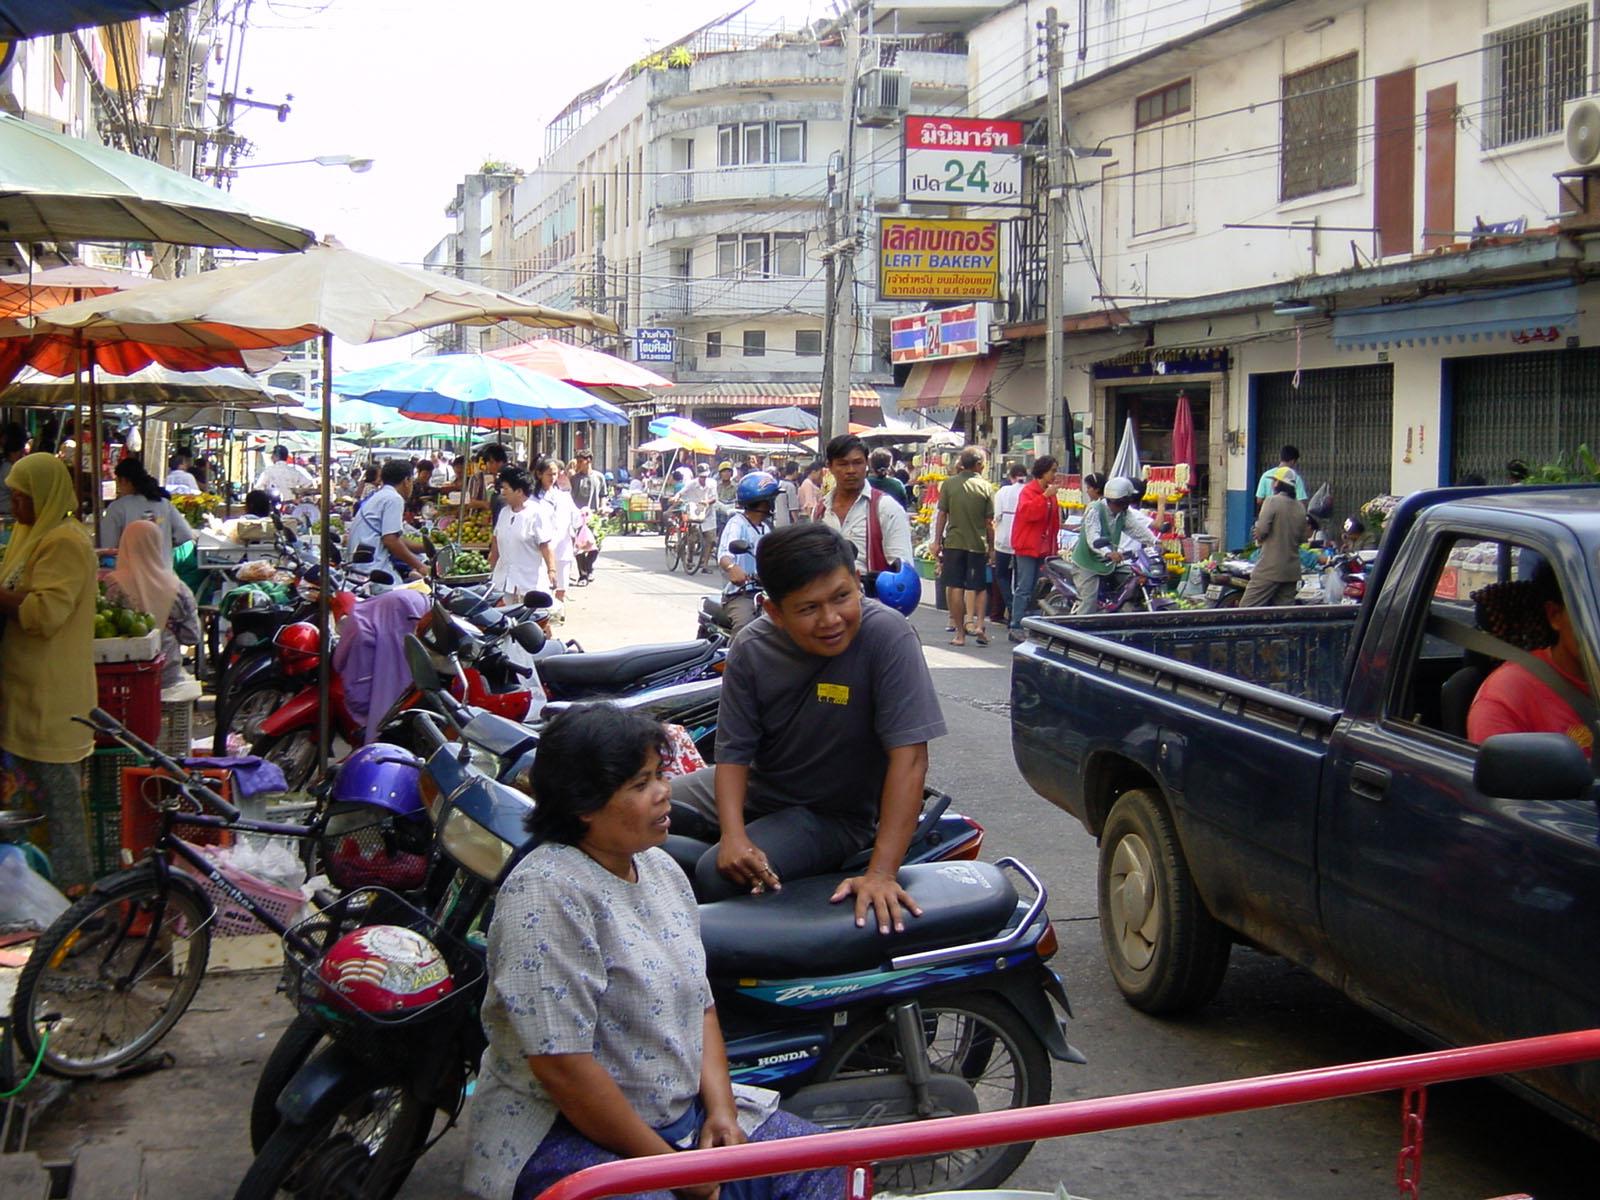 Buddhist Pilgrimage Southern Thailand Apr 2001 28